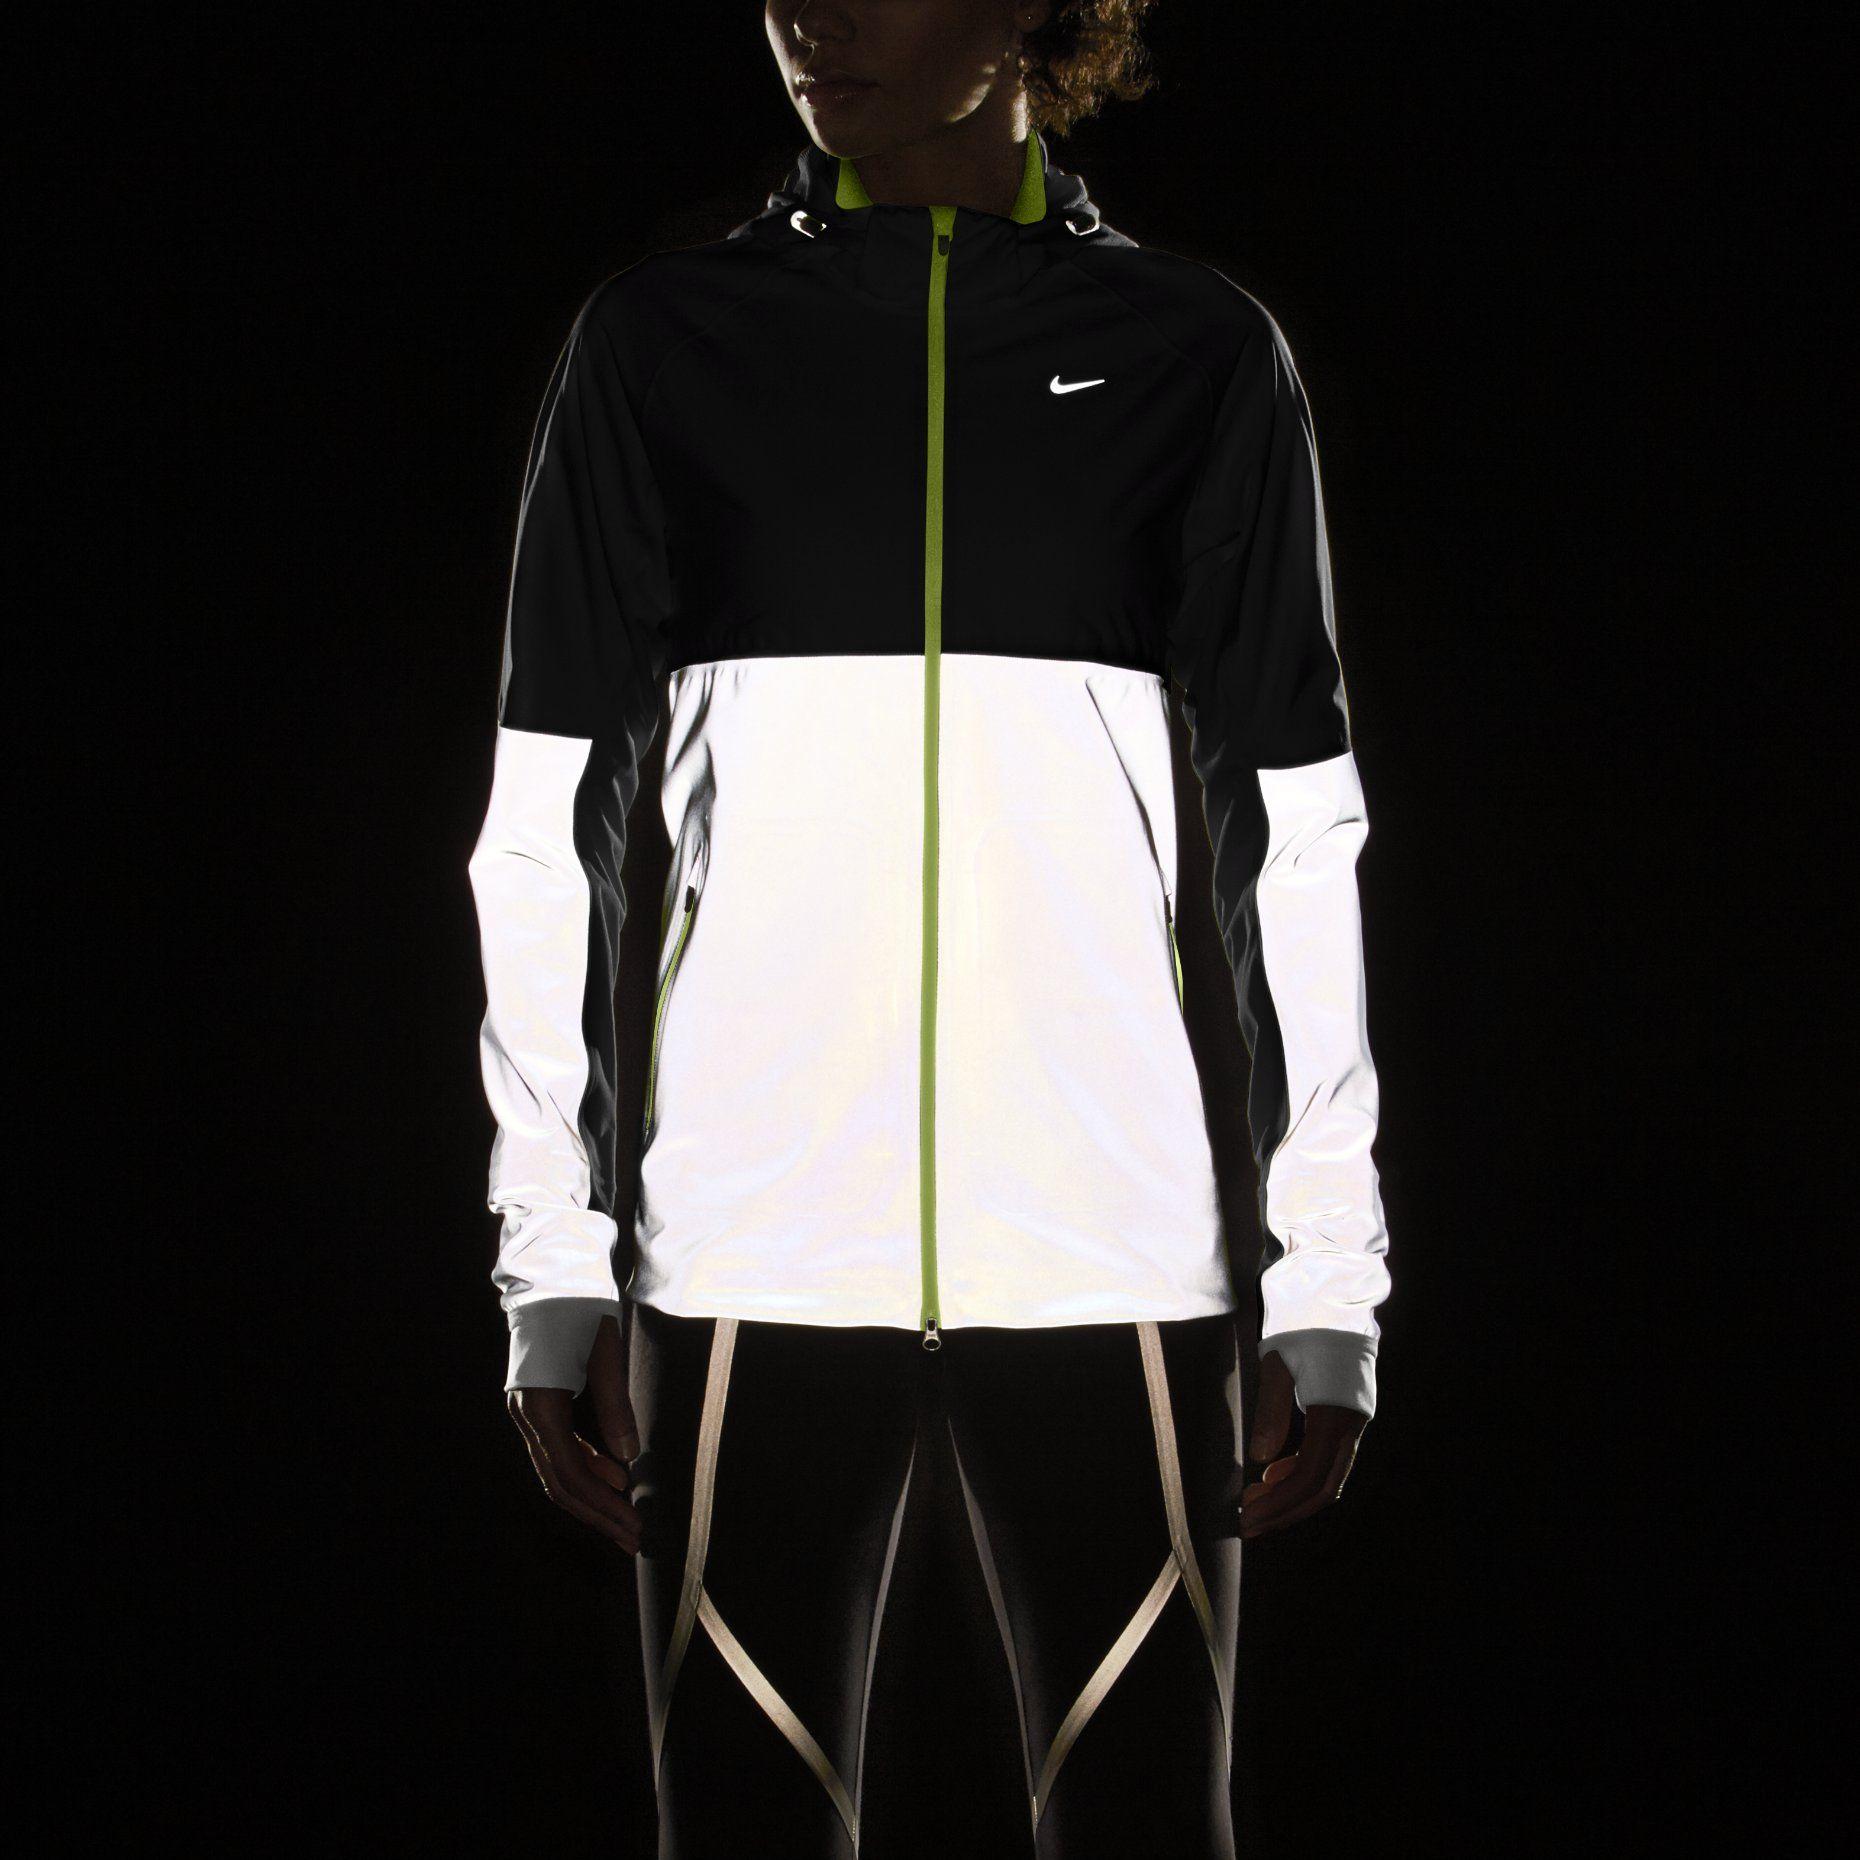 Sweat Nike Ignite Midlayer Squad 15 Noir u0026 Jaune Fluo Noir veste nike  fluo cc315be1ed4b